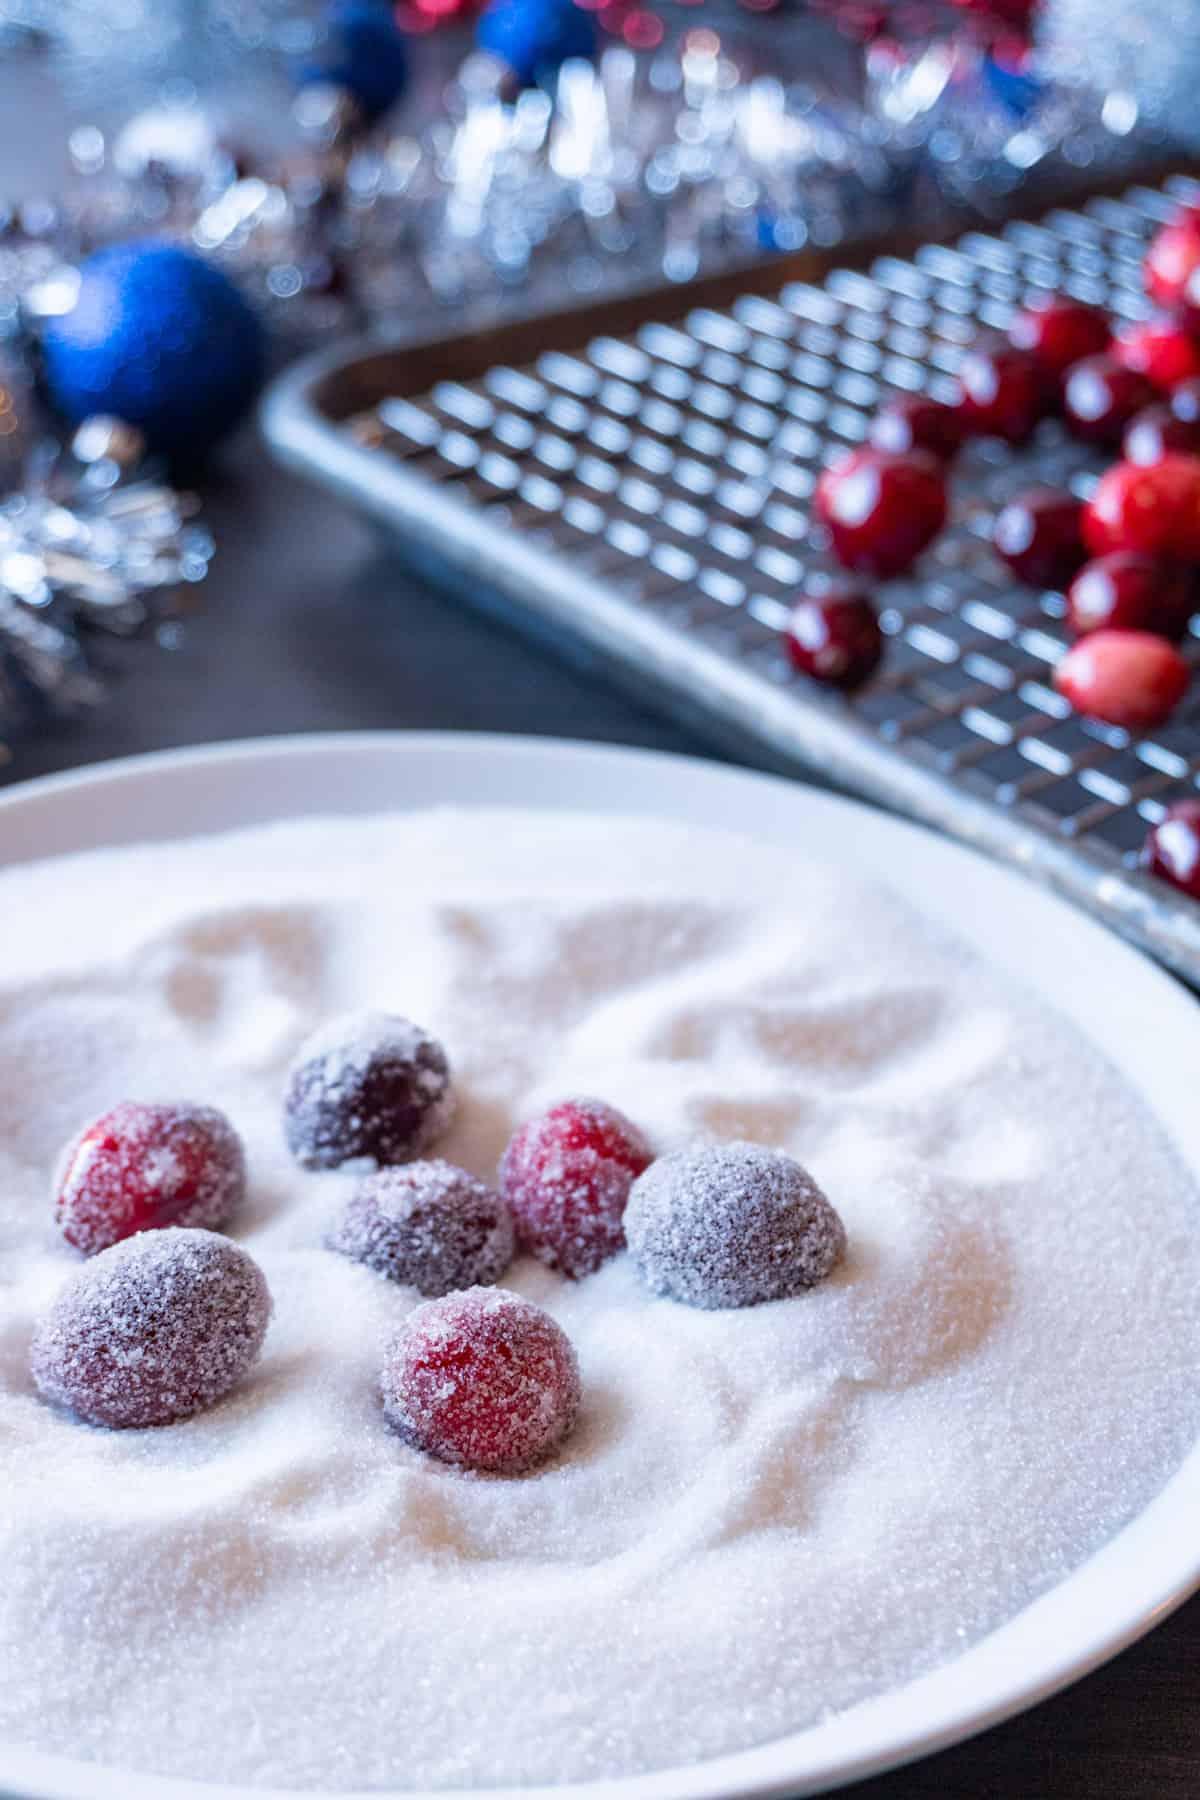 rolling cranberries in sugar